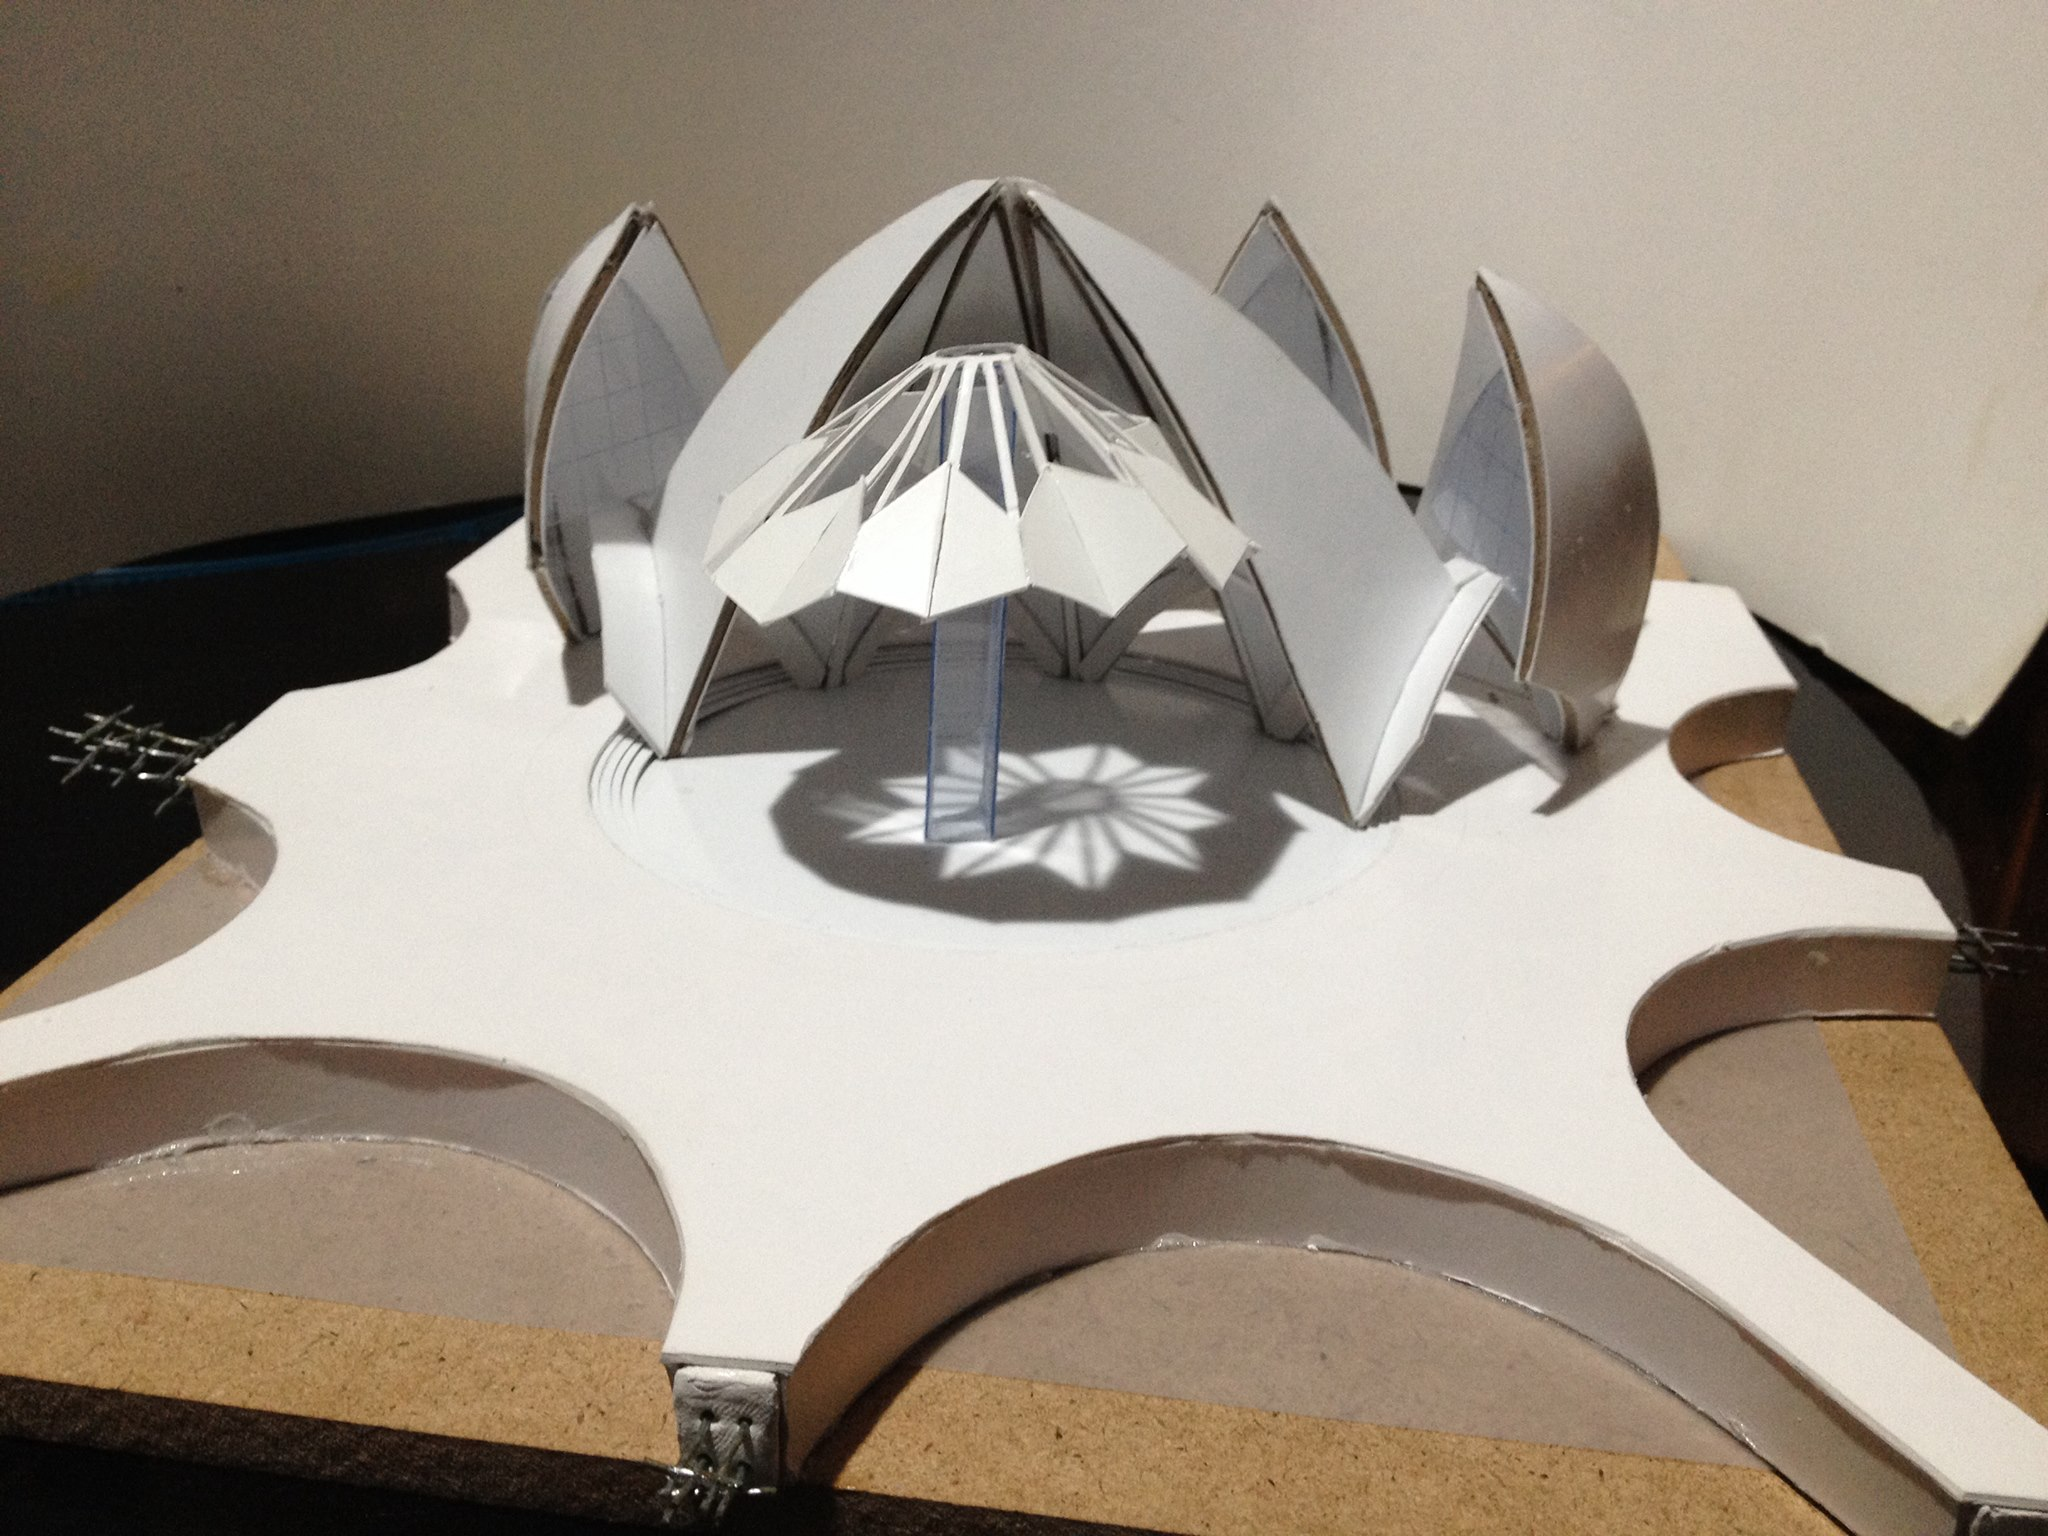 Rachelhonportfolio Sectional Model Of Lotus Temple